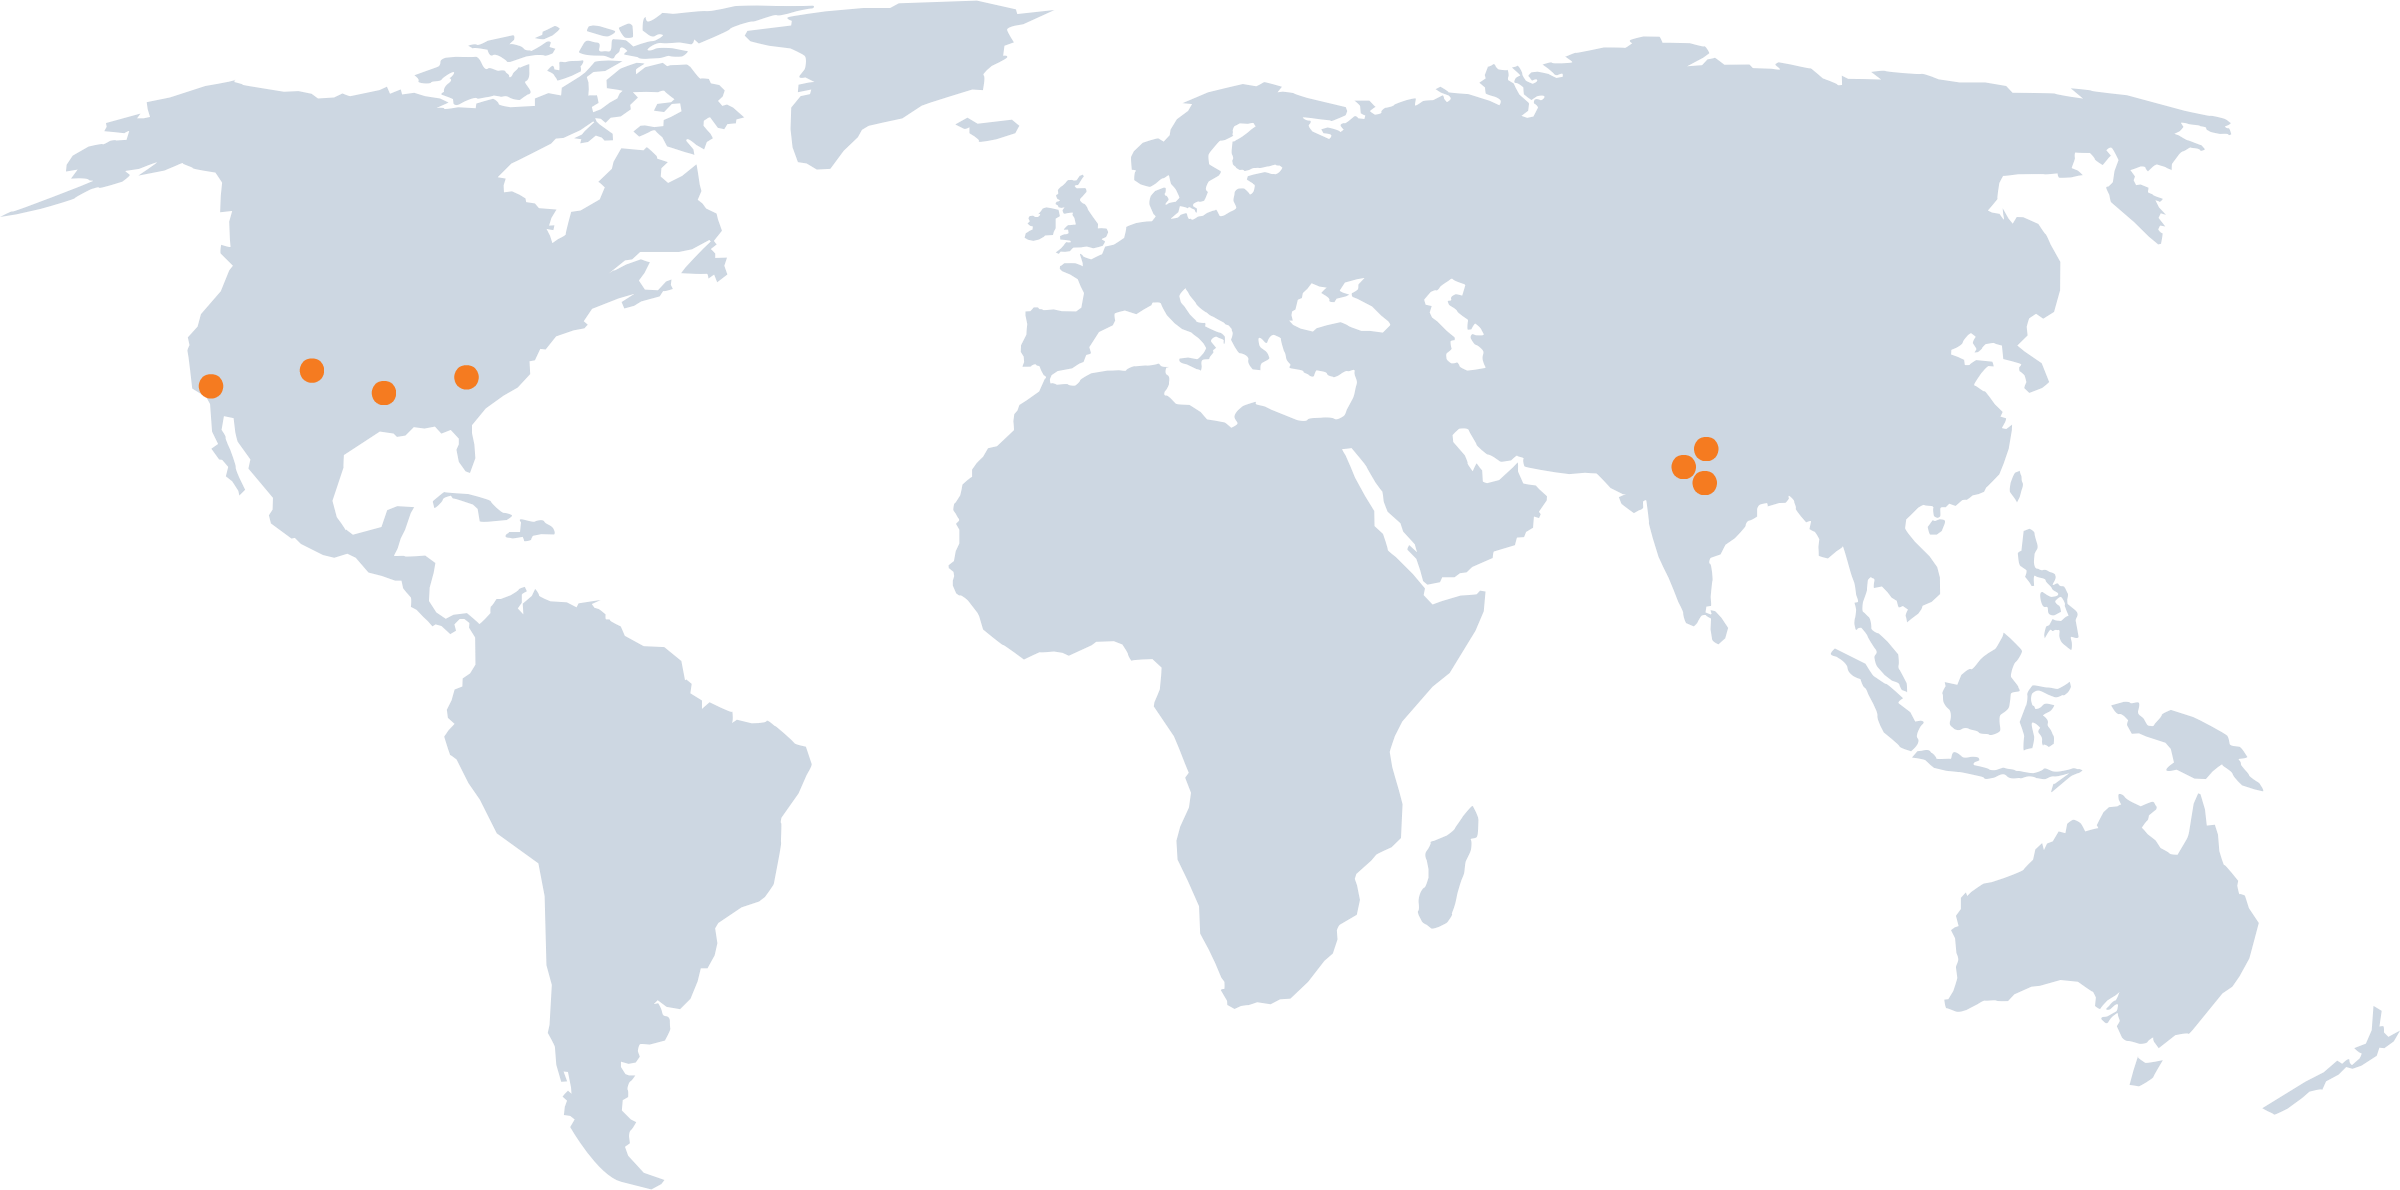 shokunin-world-map-more-detail